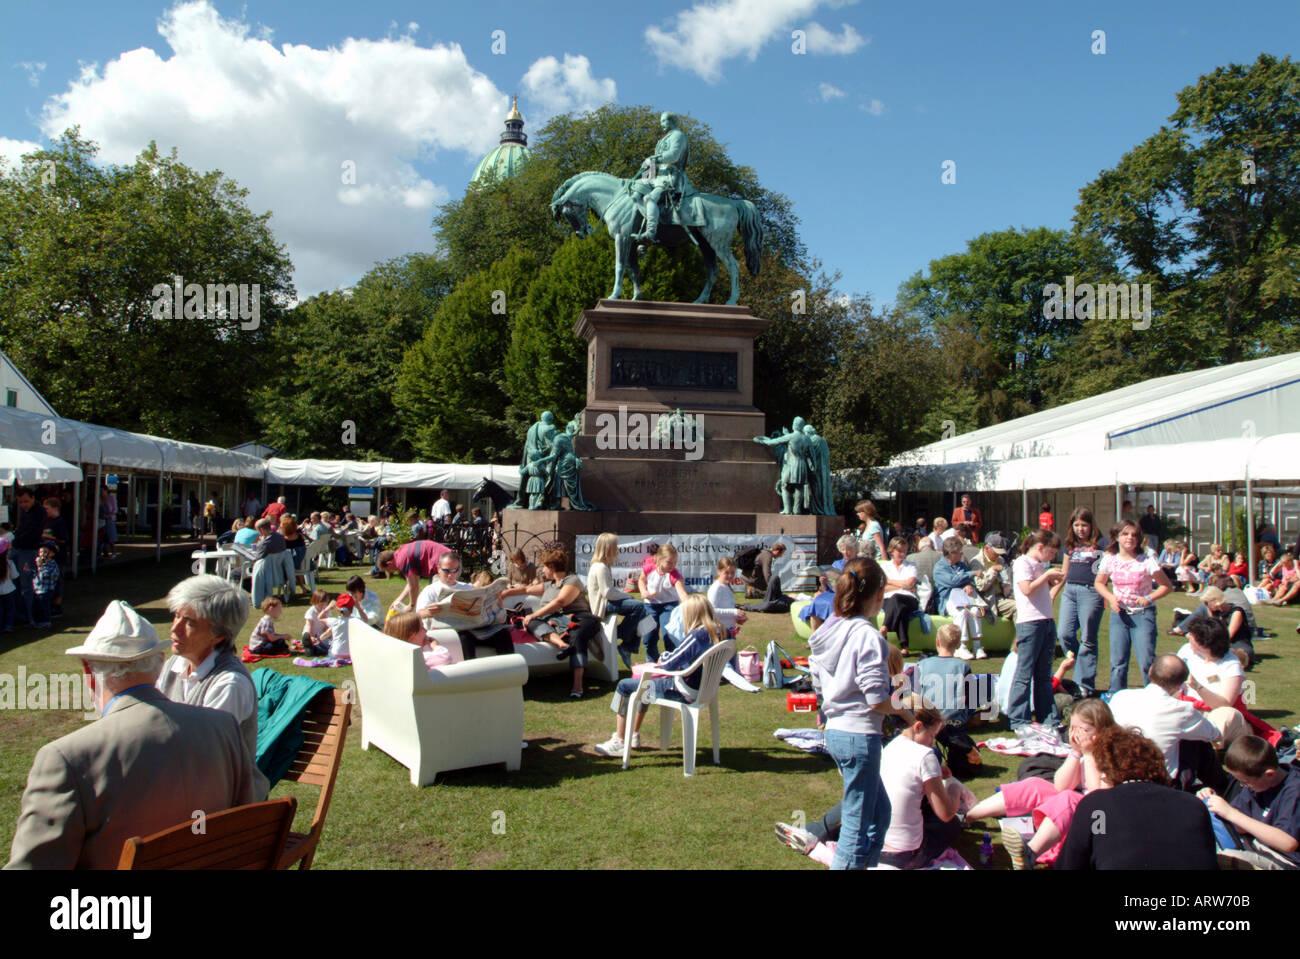 Book Festival Edinburgh Scotland - Stock Image